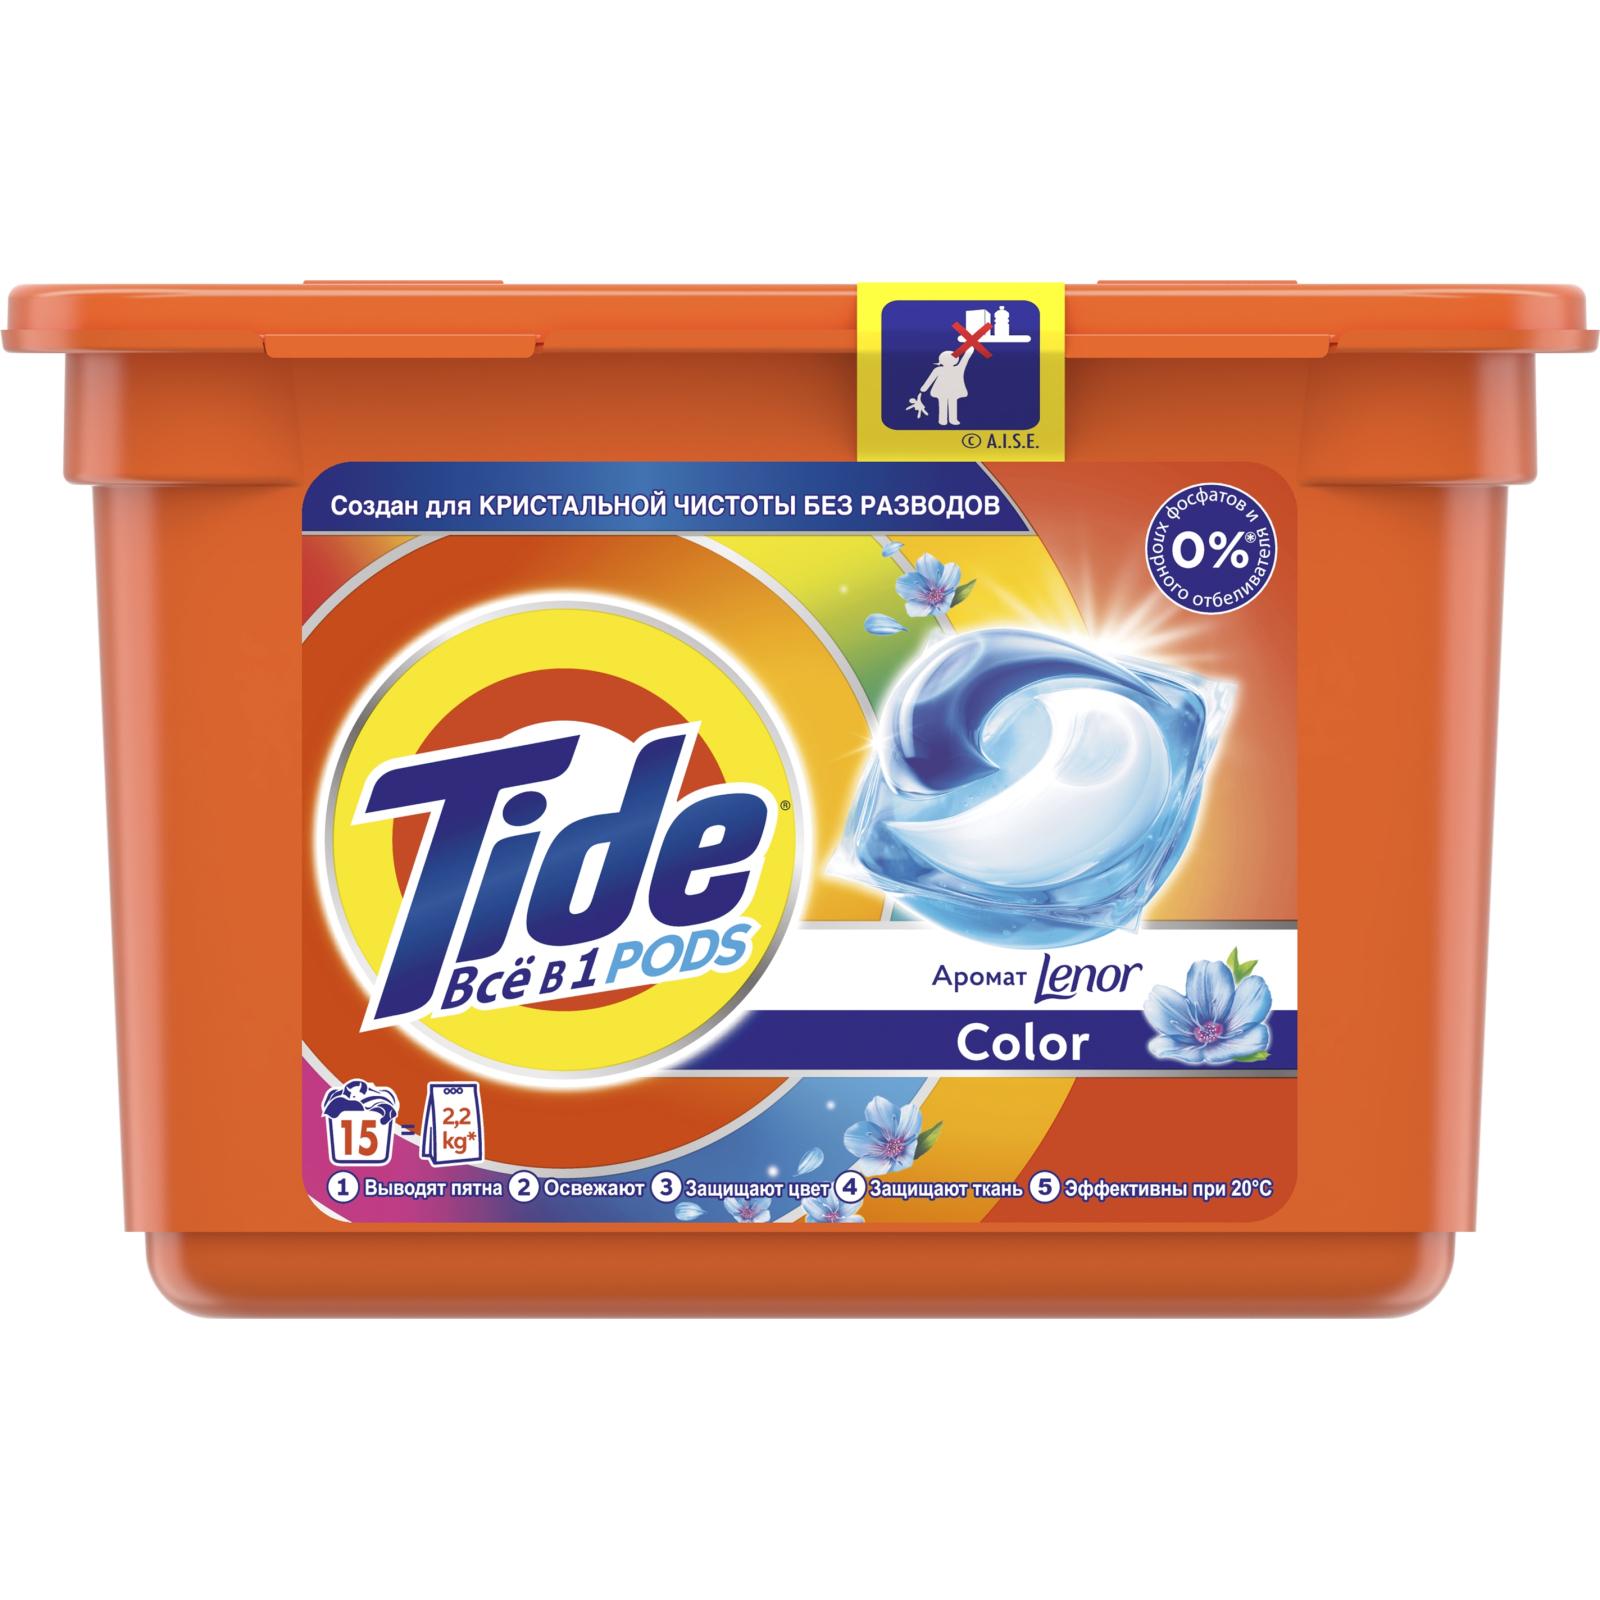 Капсулы для стирки Tide Все-в-1 Touch of Lenor Fresh Color 15 шт. (4084500569621)